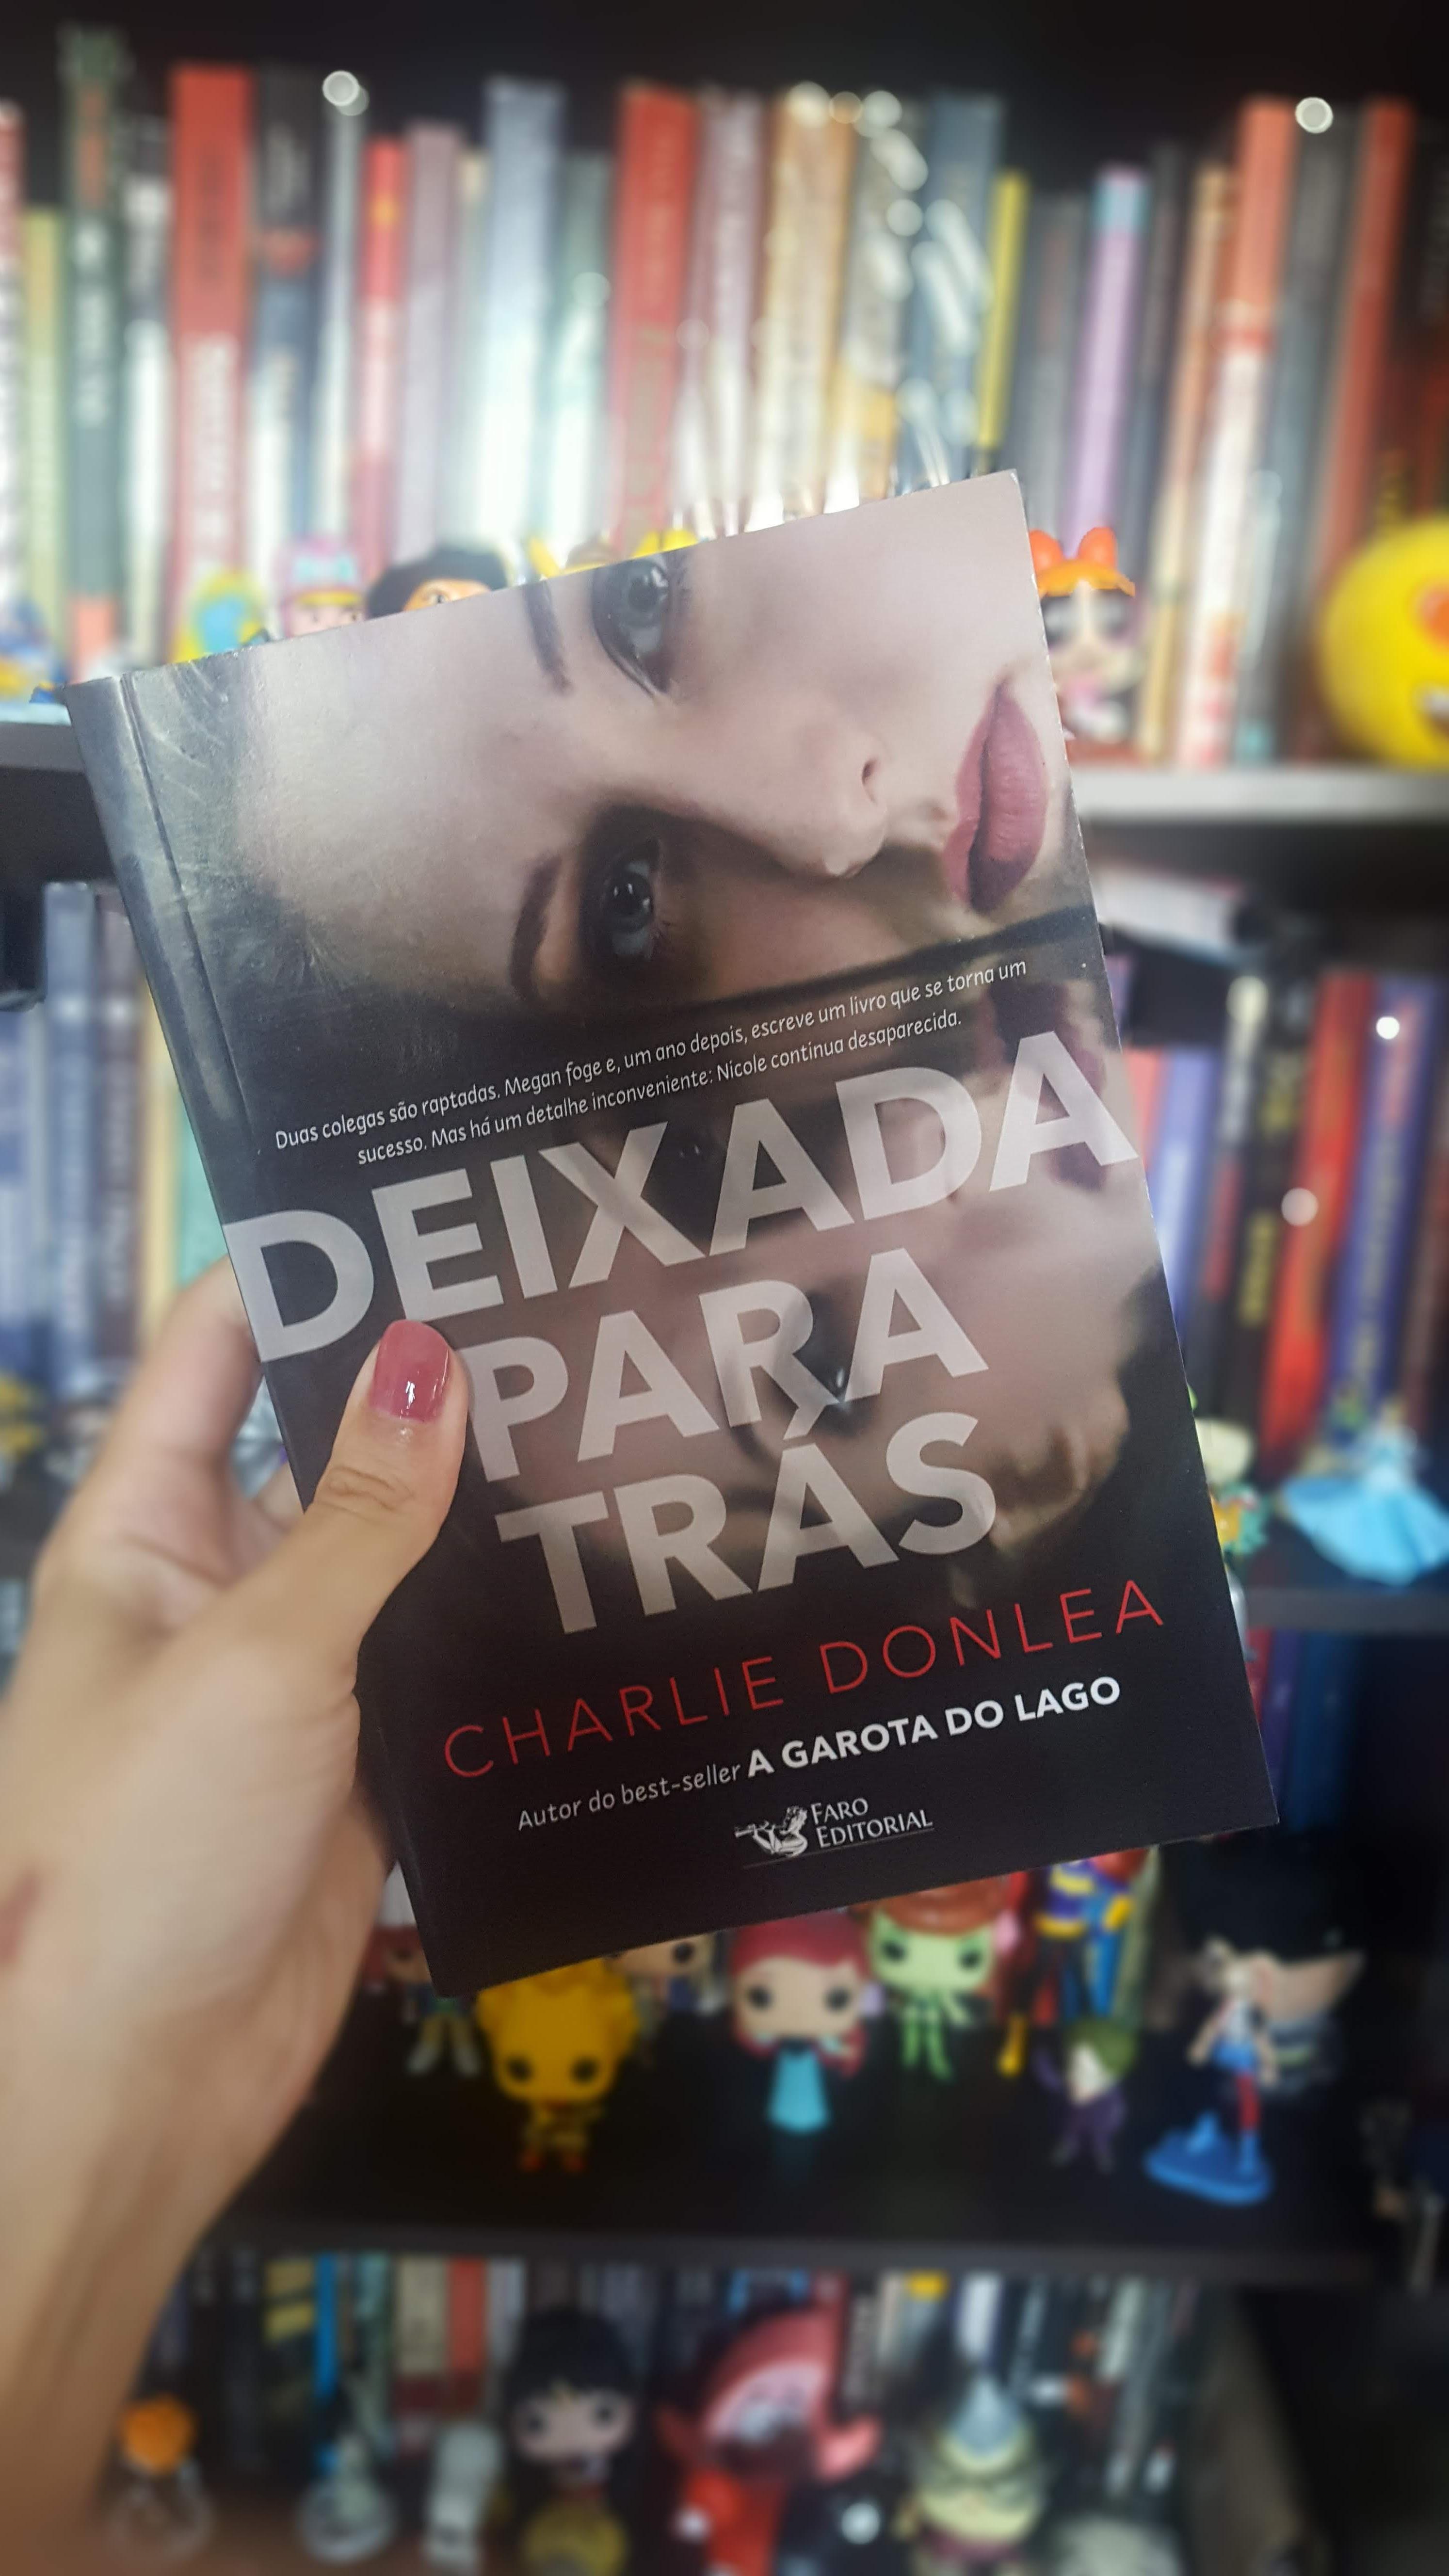 Deixada para trás | Charlie Donlea